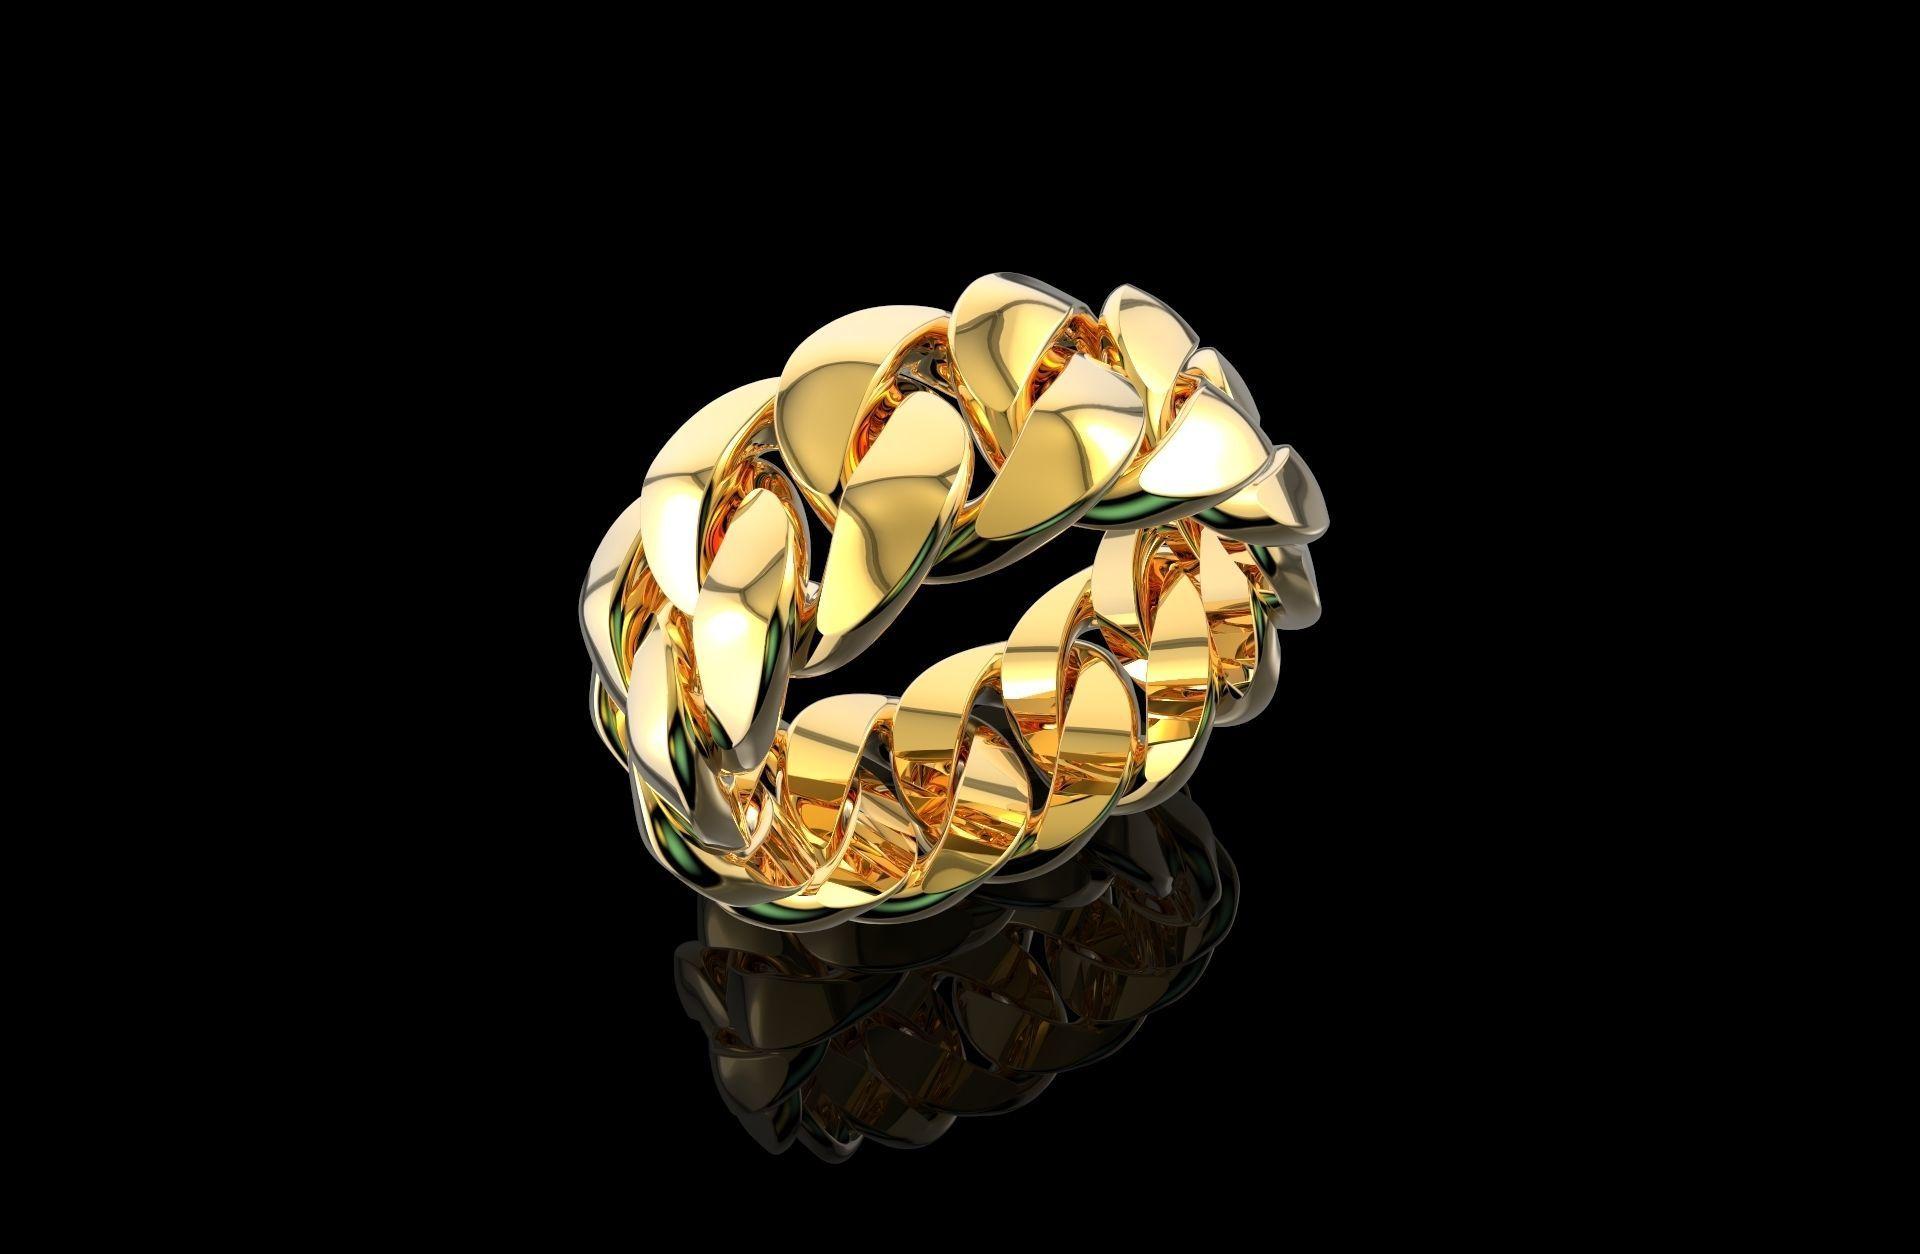 Gold N785